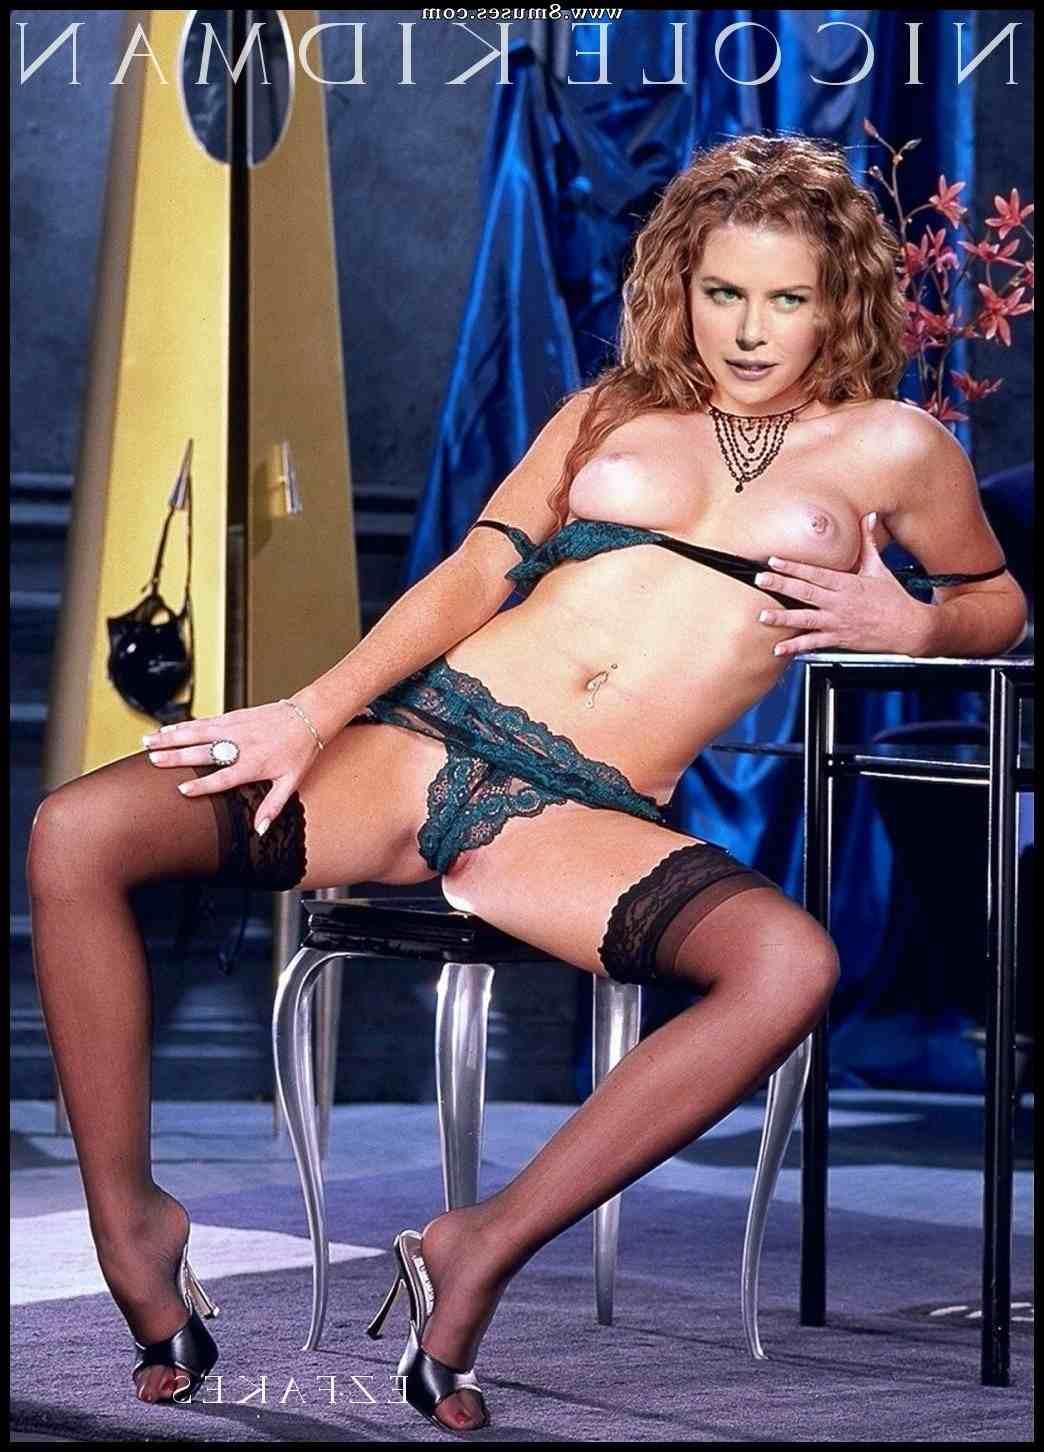 Fake-Celebrities-Sex-Pictures/Nicole-Kidman Nicole_Kidman__8muses_-_Sex_and_Porn_Comics_614.jpg